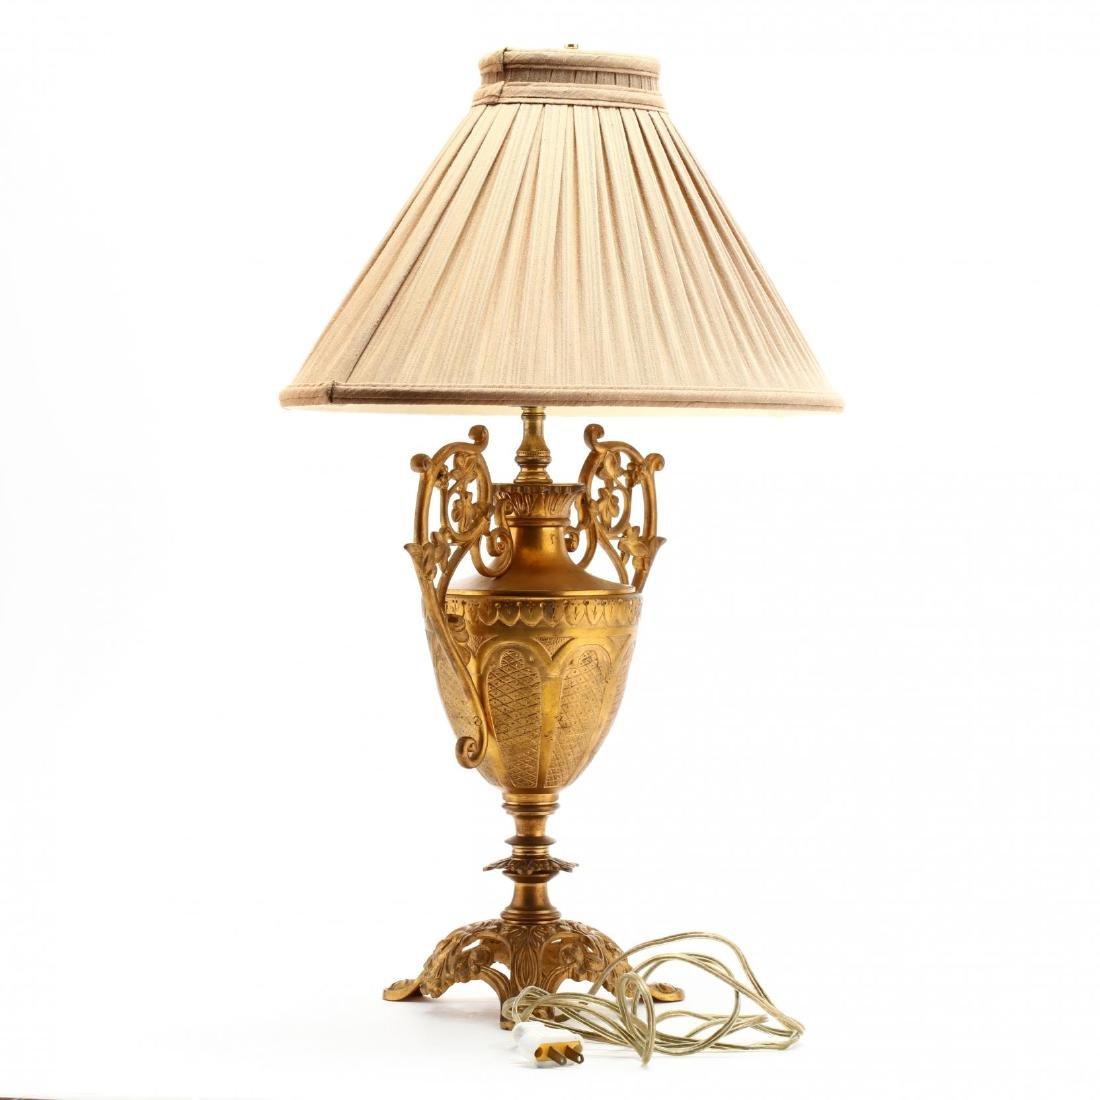 Renaissance Style Urn Form Table Lamp - 3